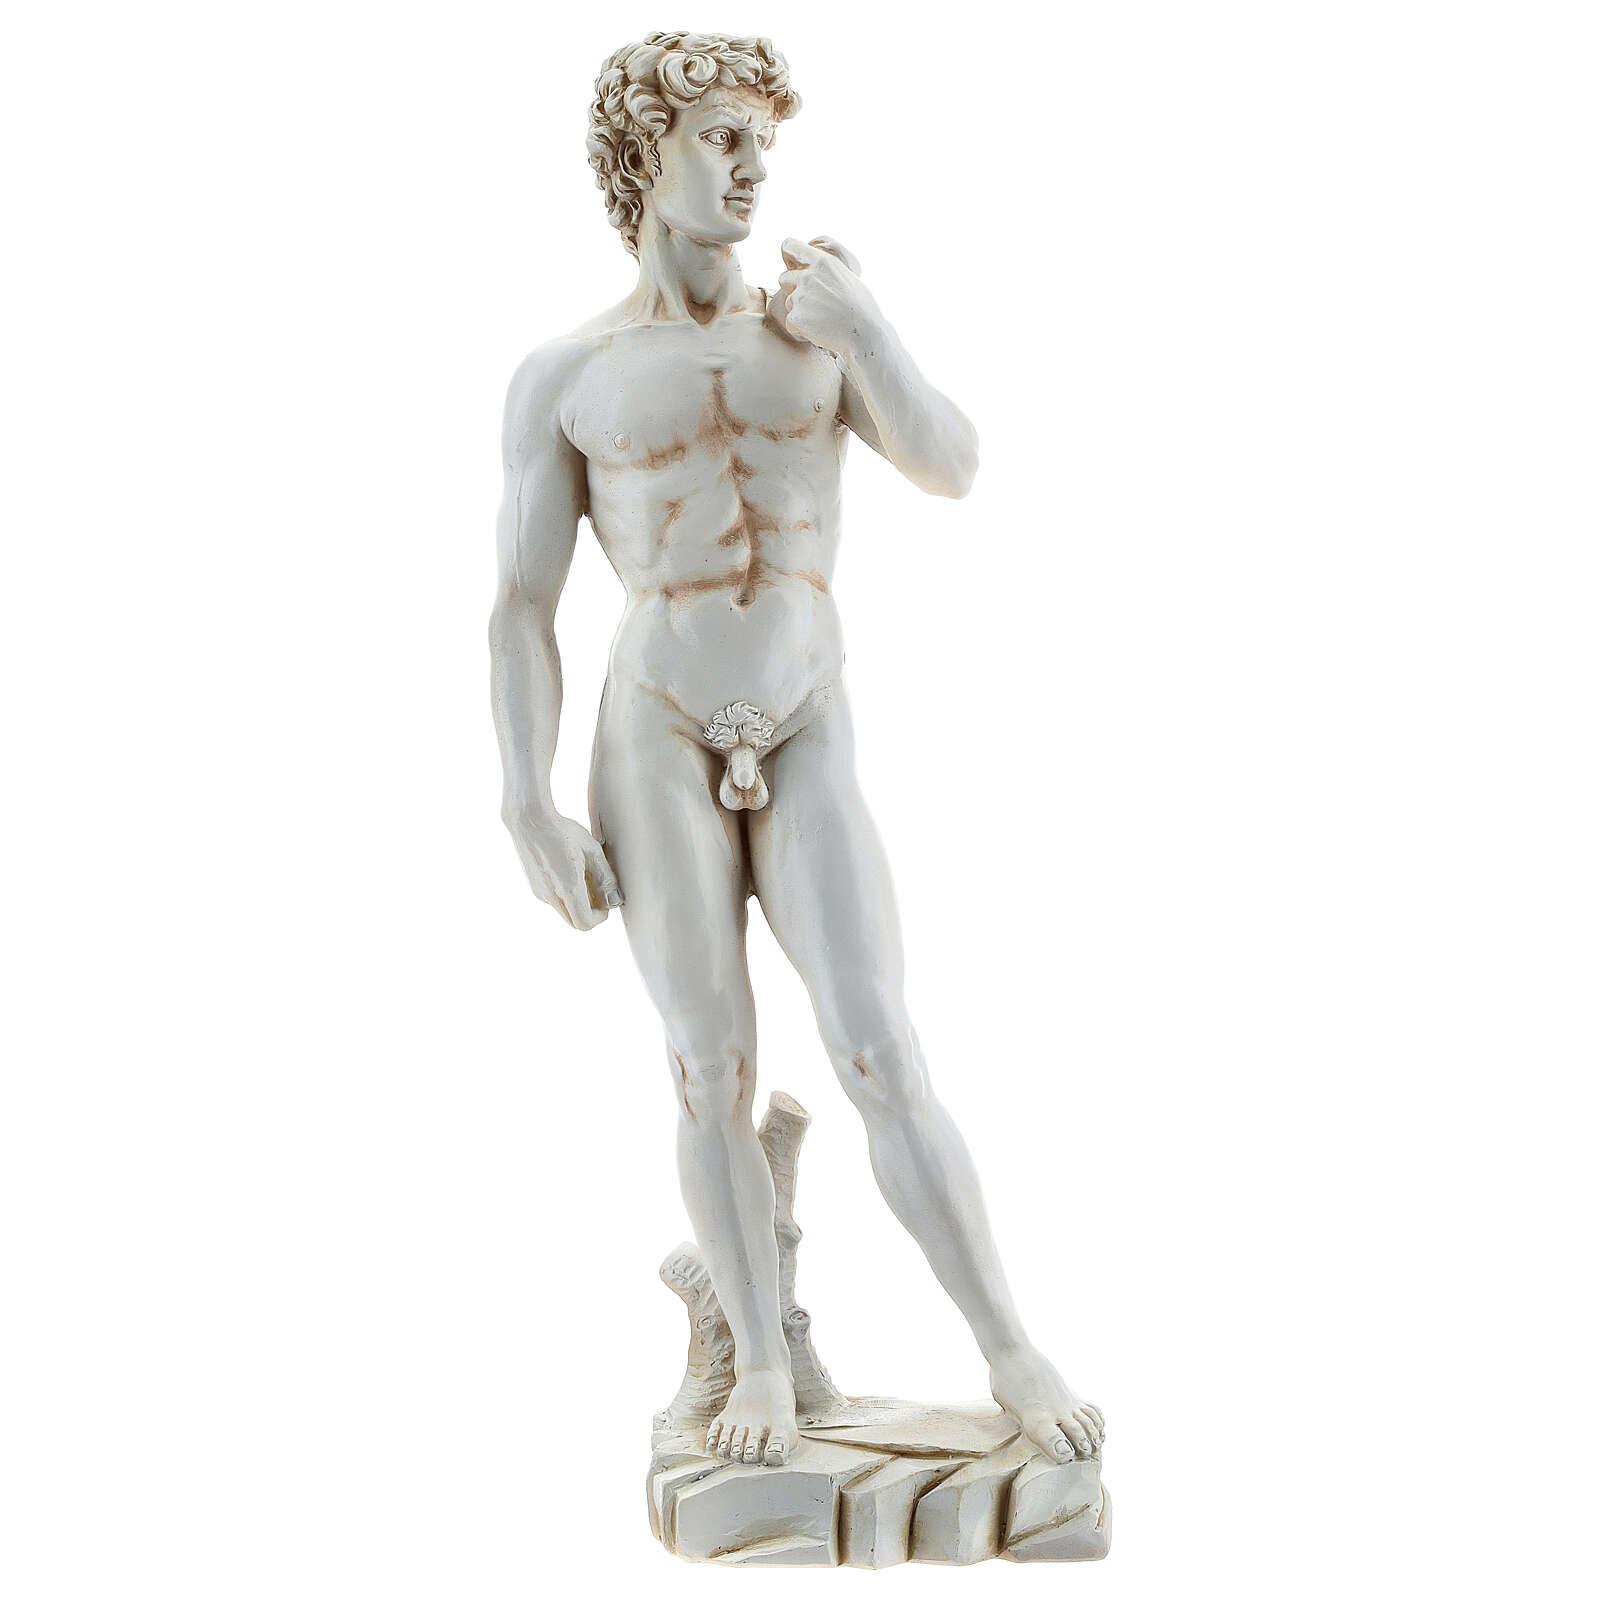 David Michelangelo riproduzione statua resina 31 cm 4